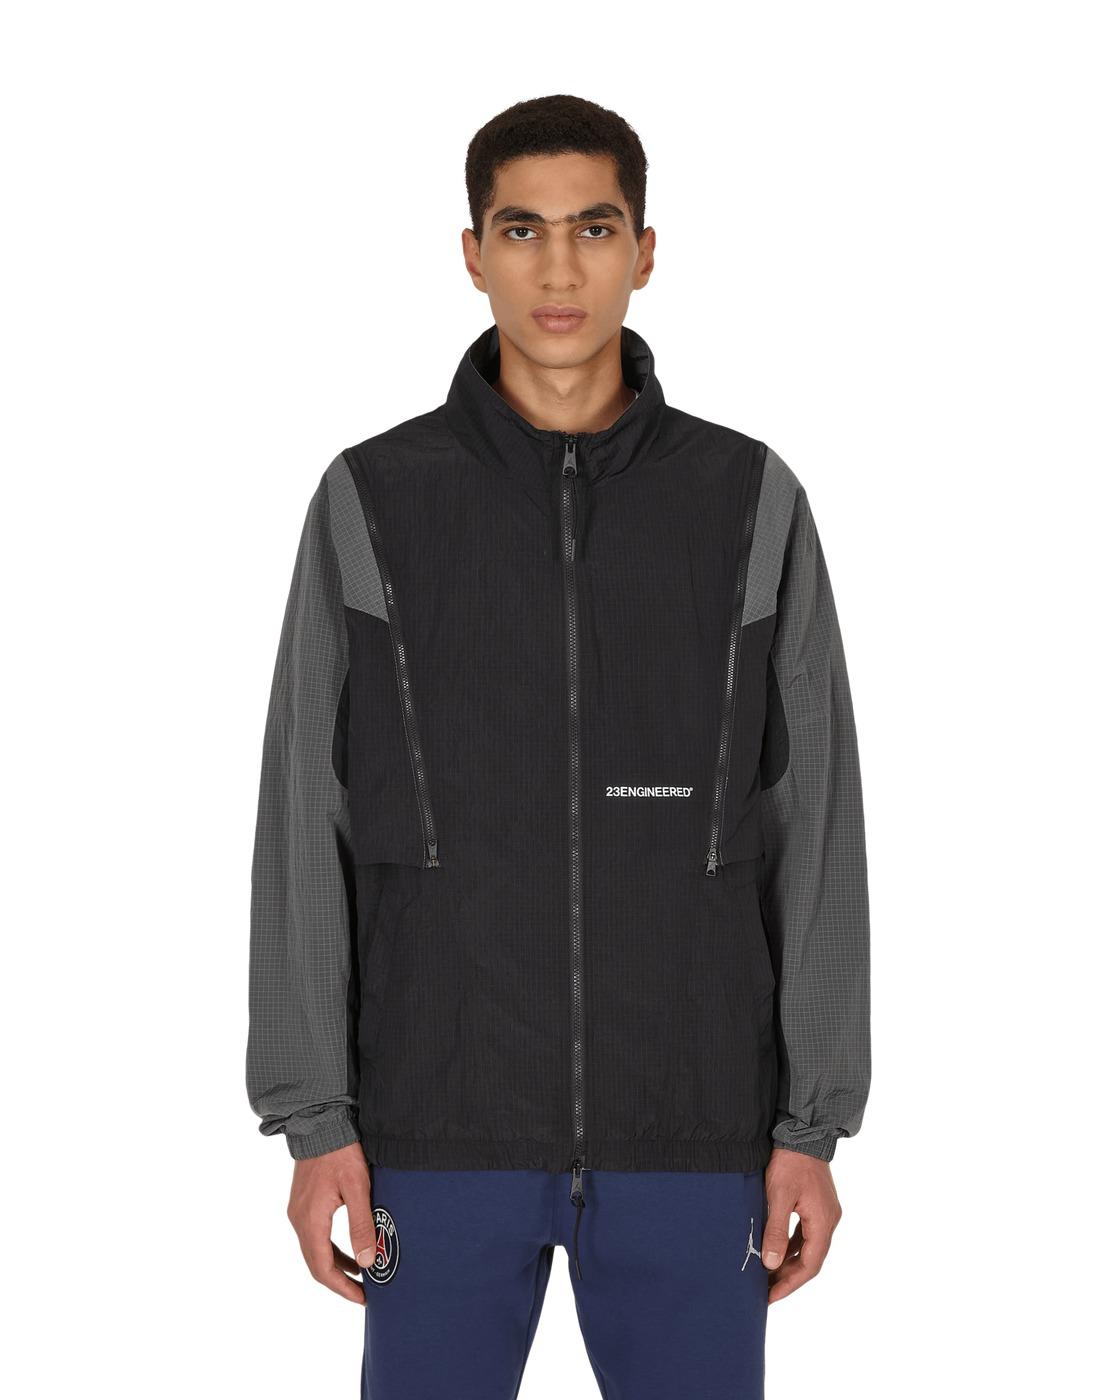 Photo: Nike Jordan 23 Engineered Woven Jacket Black/Iron Grey